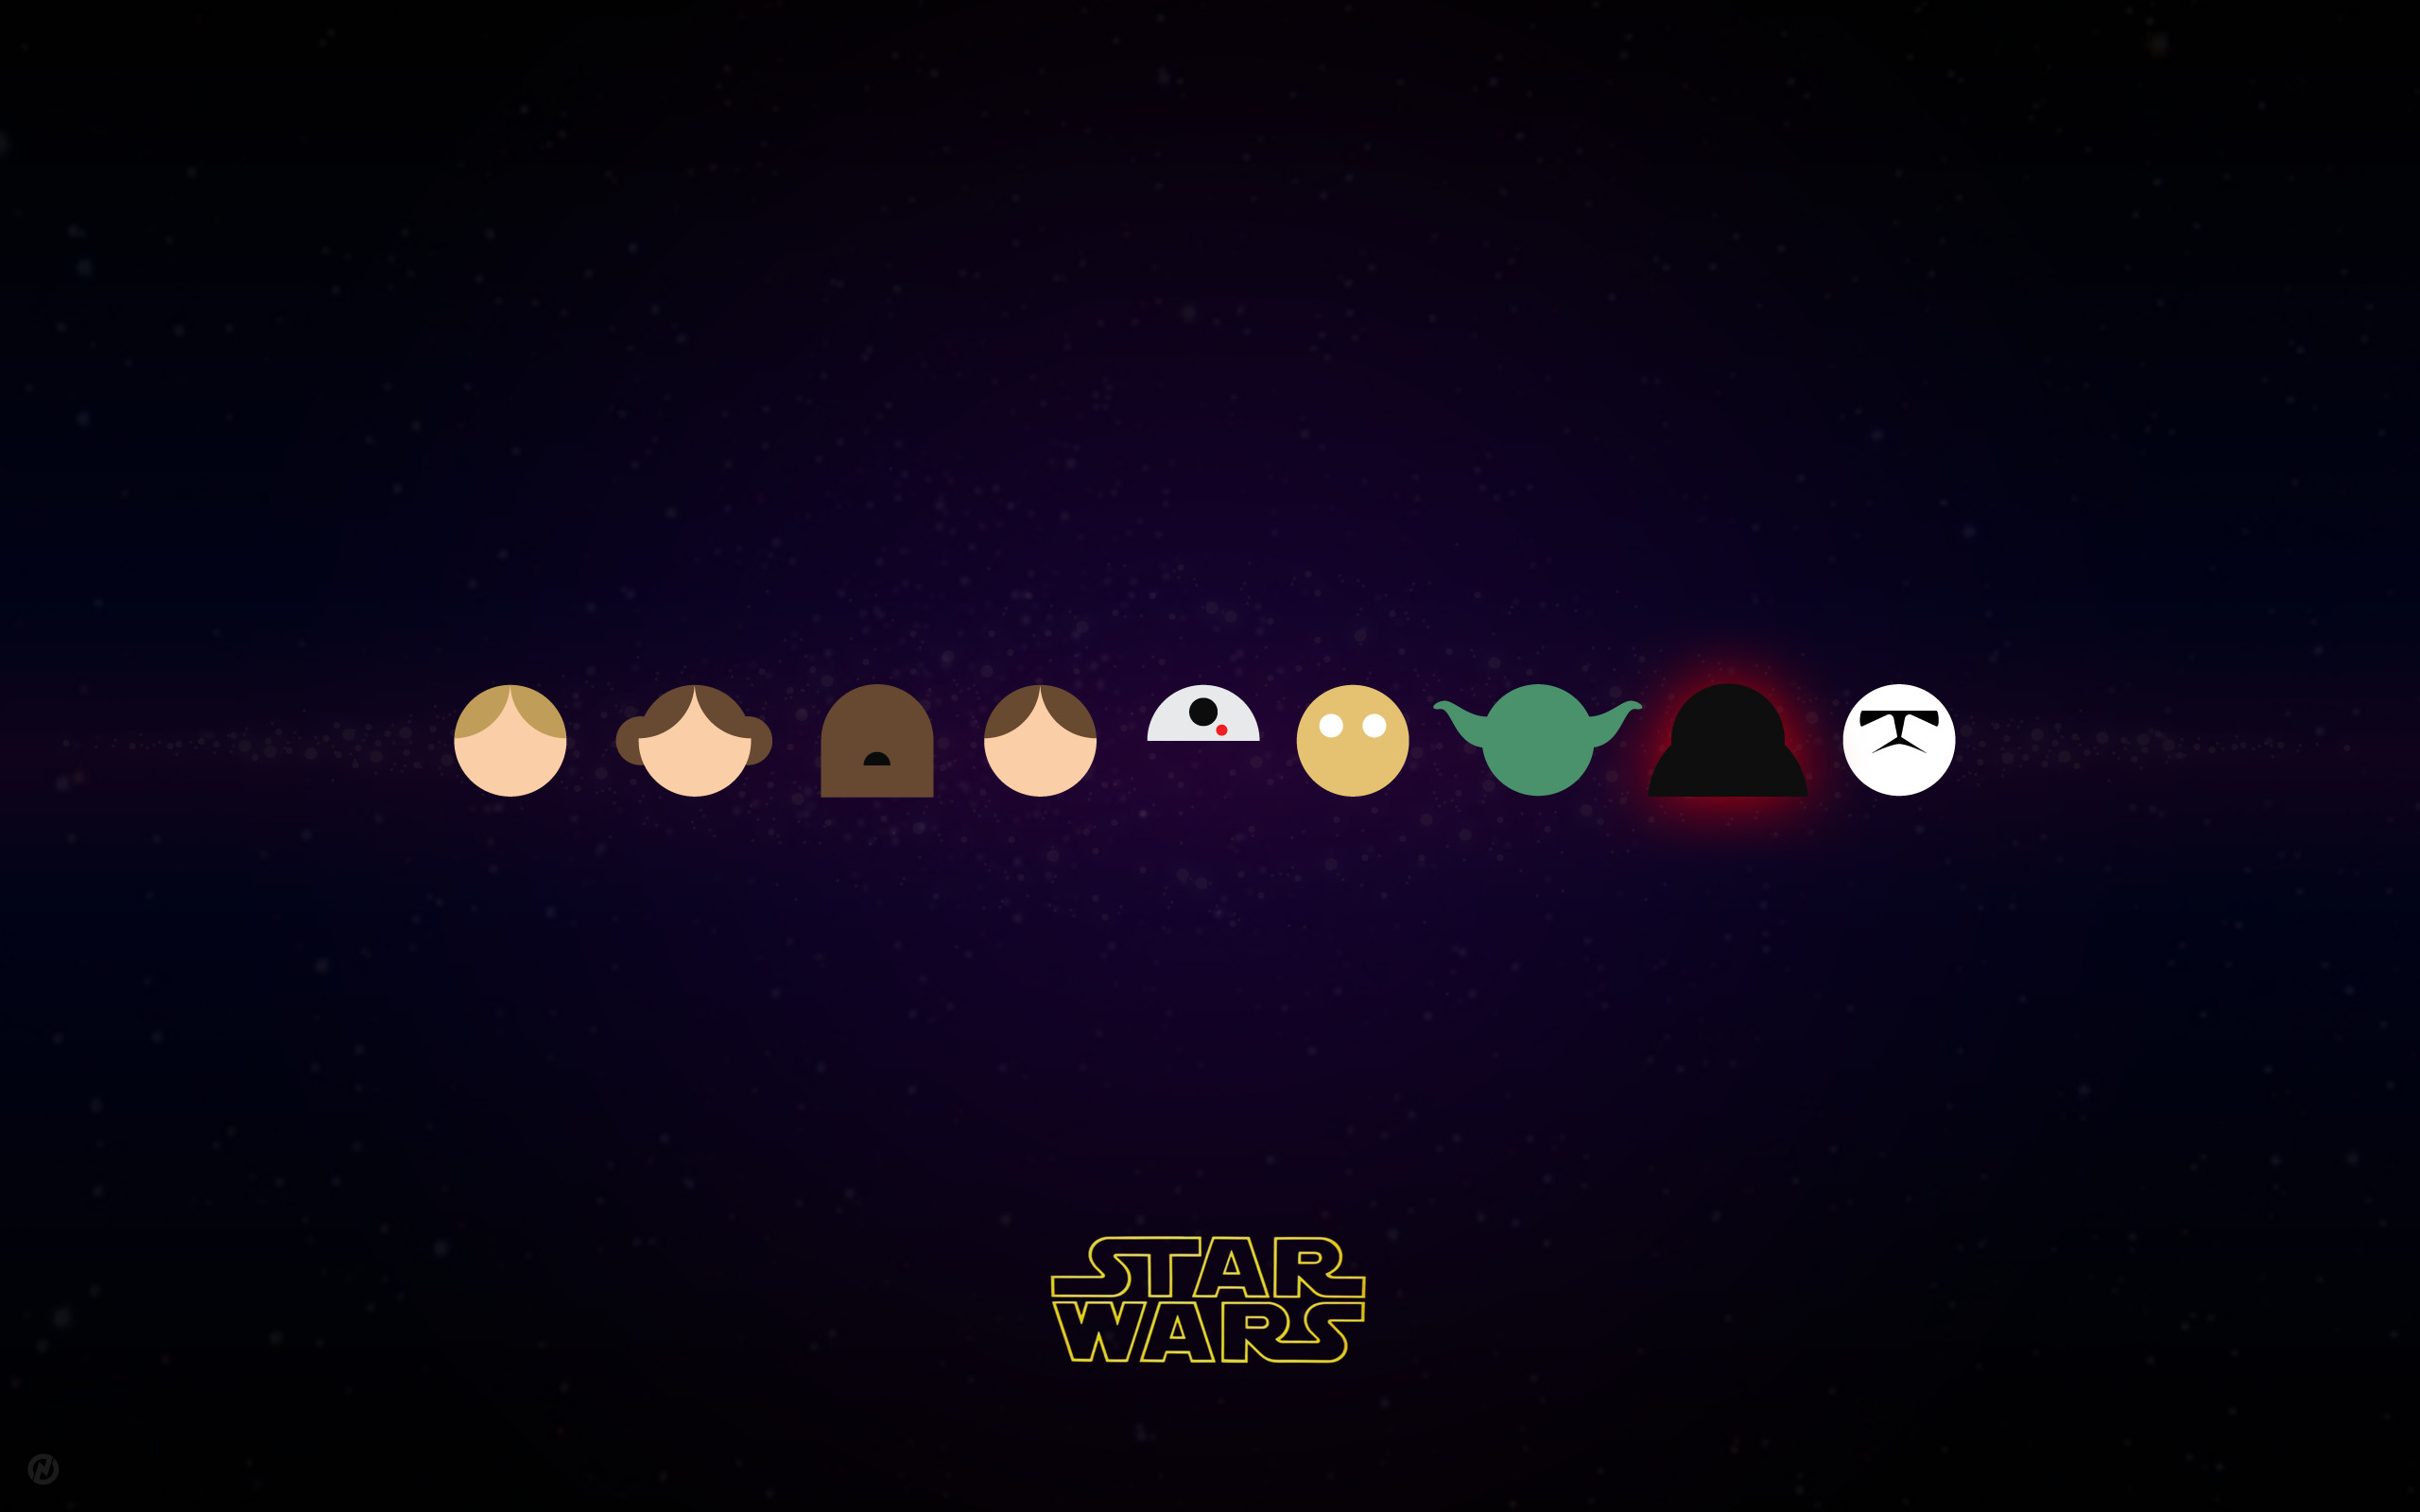 Lego Star Wars Wallpaper Hd Star Wars Pulp Fiction Wallpaper 57 Images